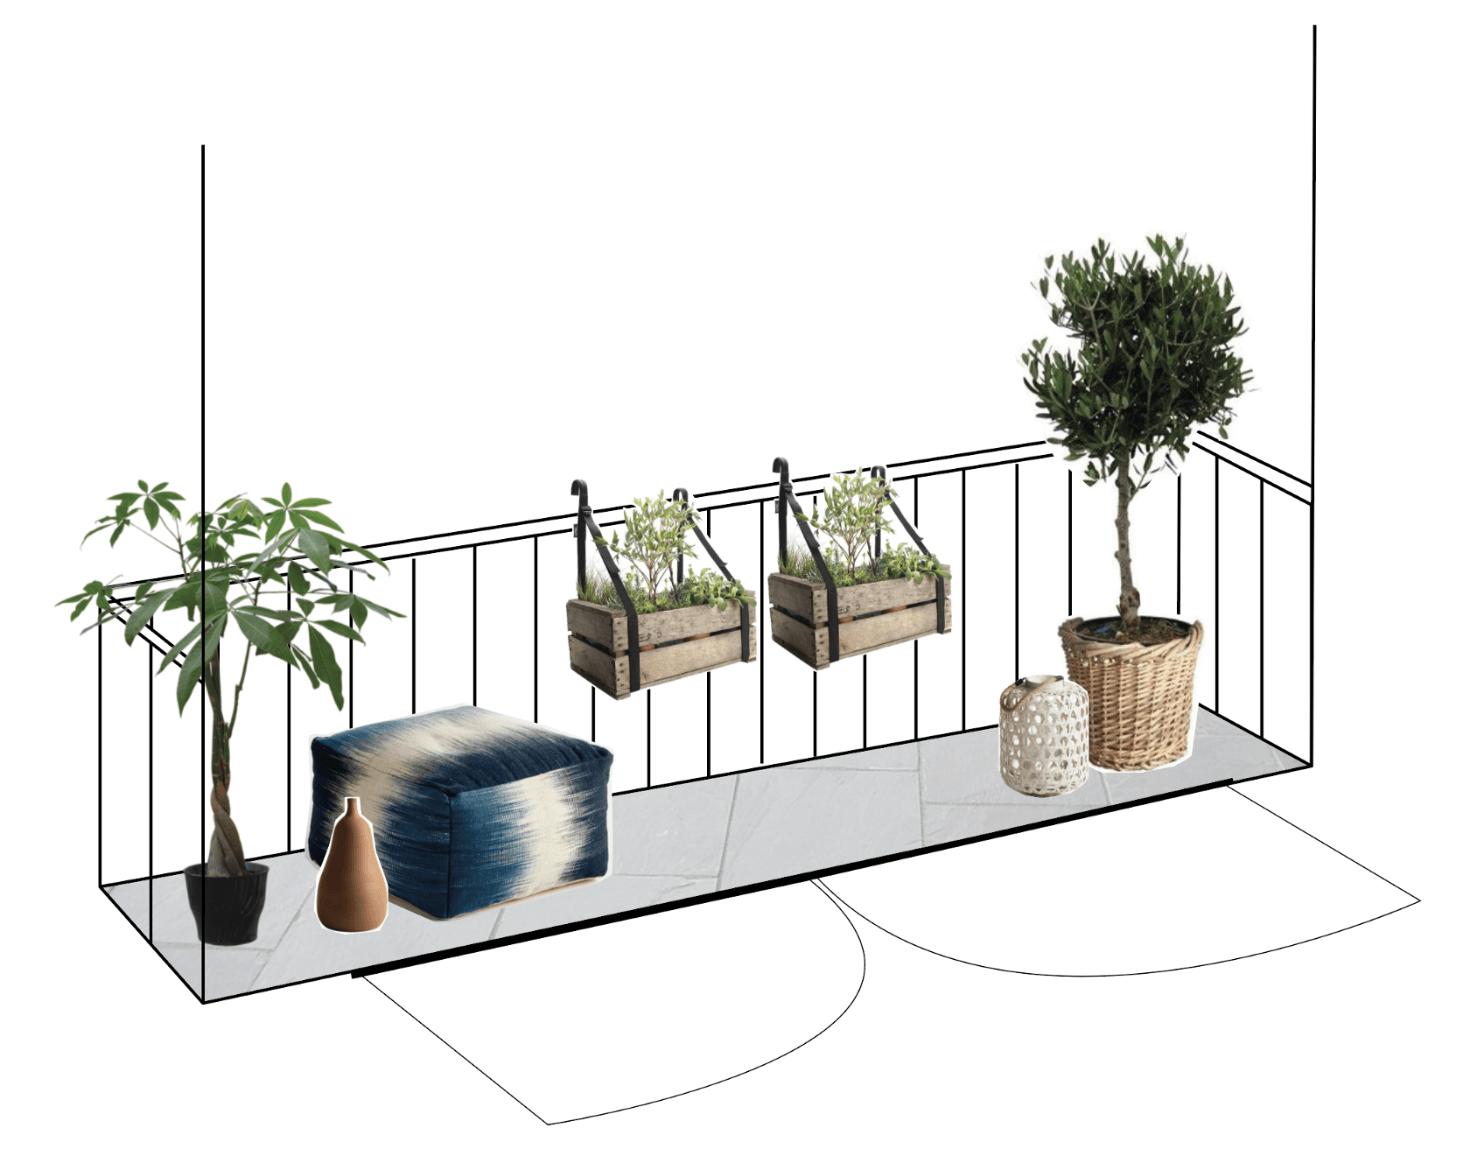 bumper-blog-news-immobilier-lyon-appartement-vente-achat-investir-homestaging-design-decoration-lifestyle-art-15.png